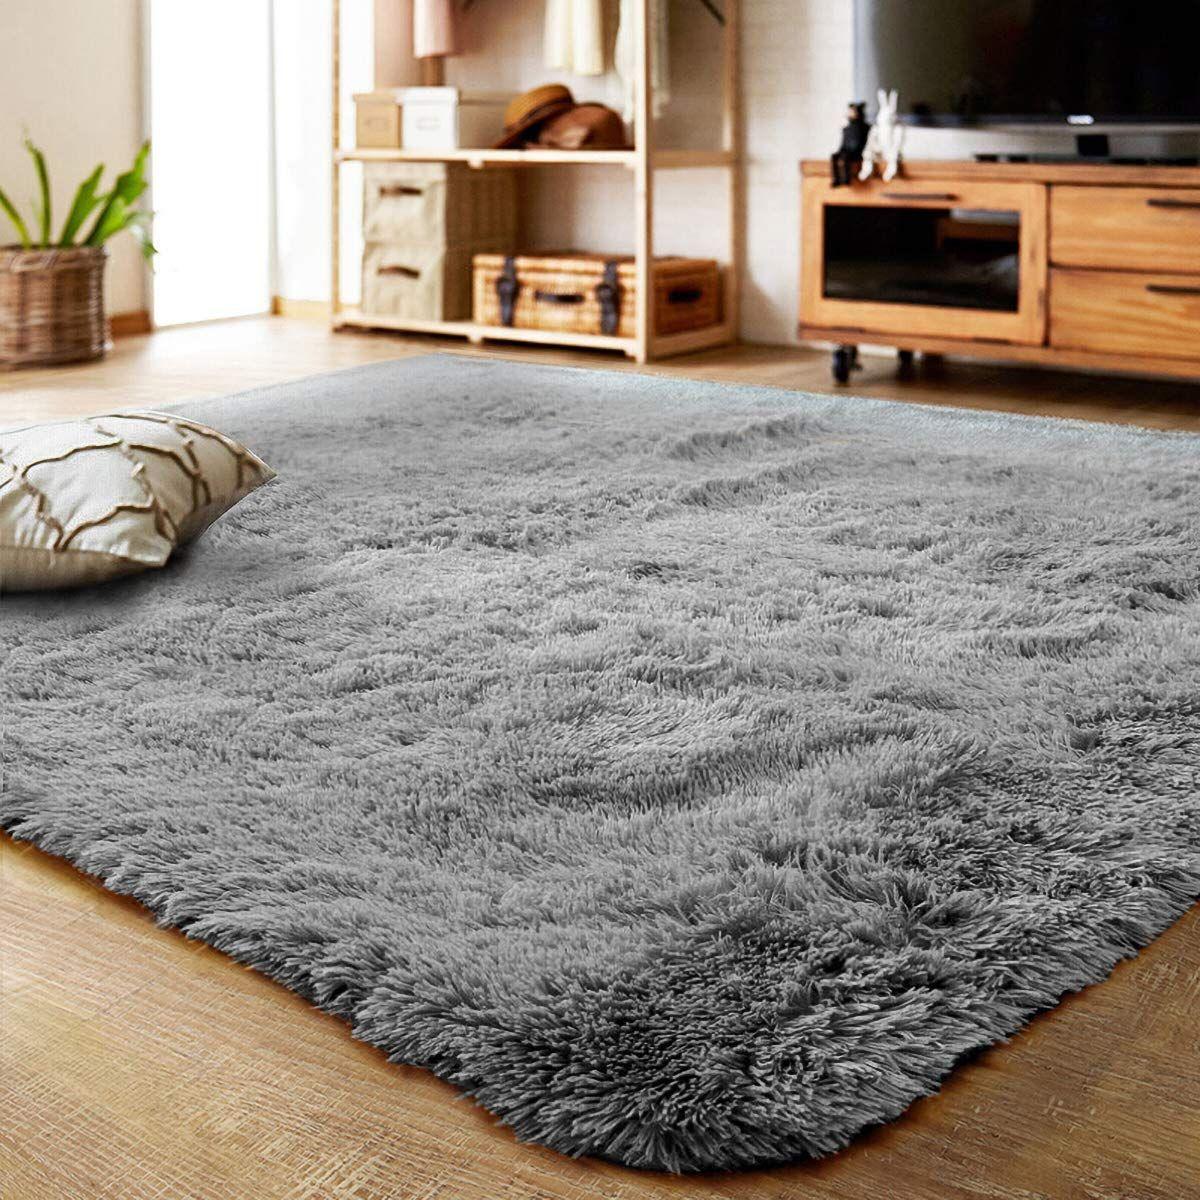 Lochas Ultra Soft Indoor Modern Area Rugs Fluffy Living Room Carpets Suitable For Children Bedroom Home Decor Nur Living Room Carpet Room Carpet Bedroom Carpet